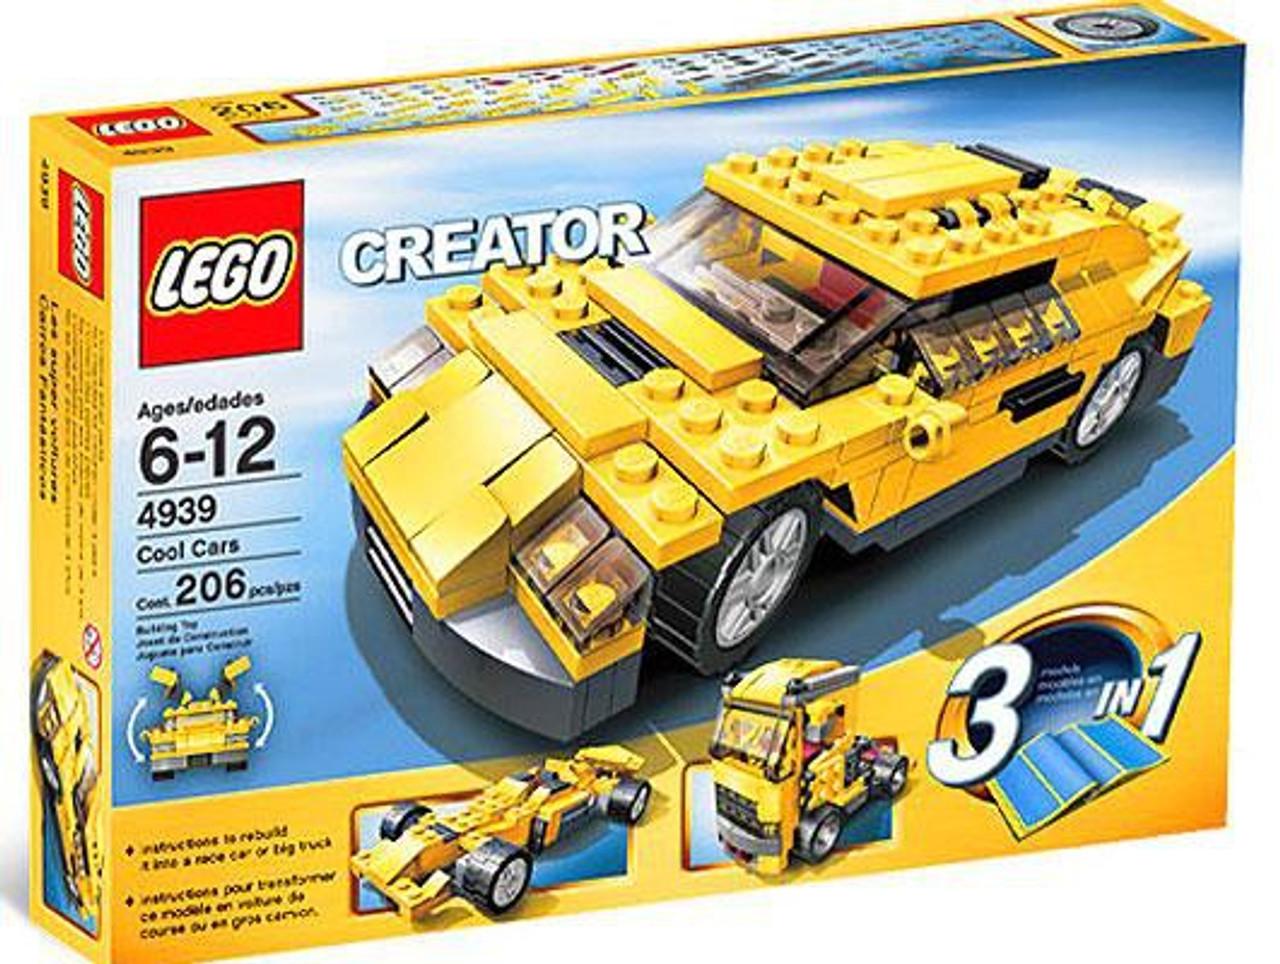 Lego Creator Cool Cars Set 4939